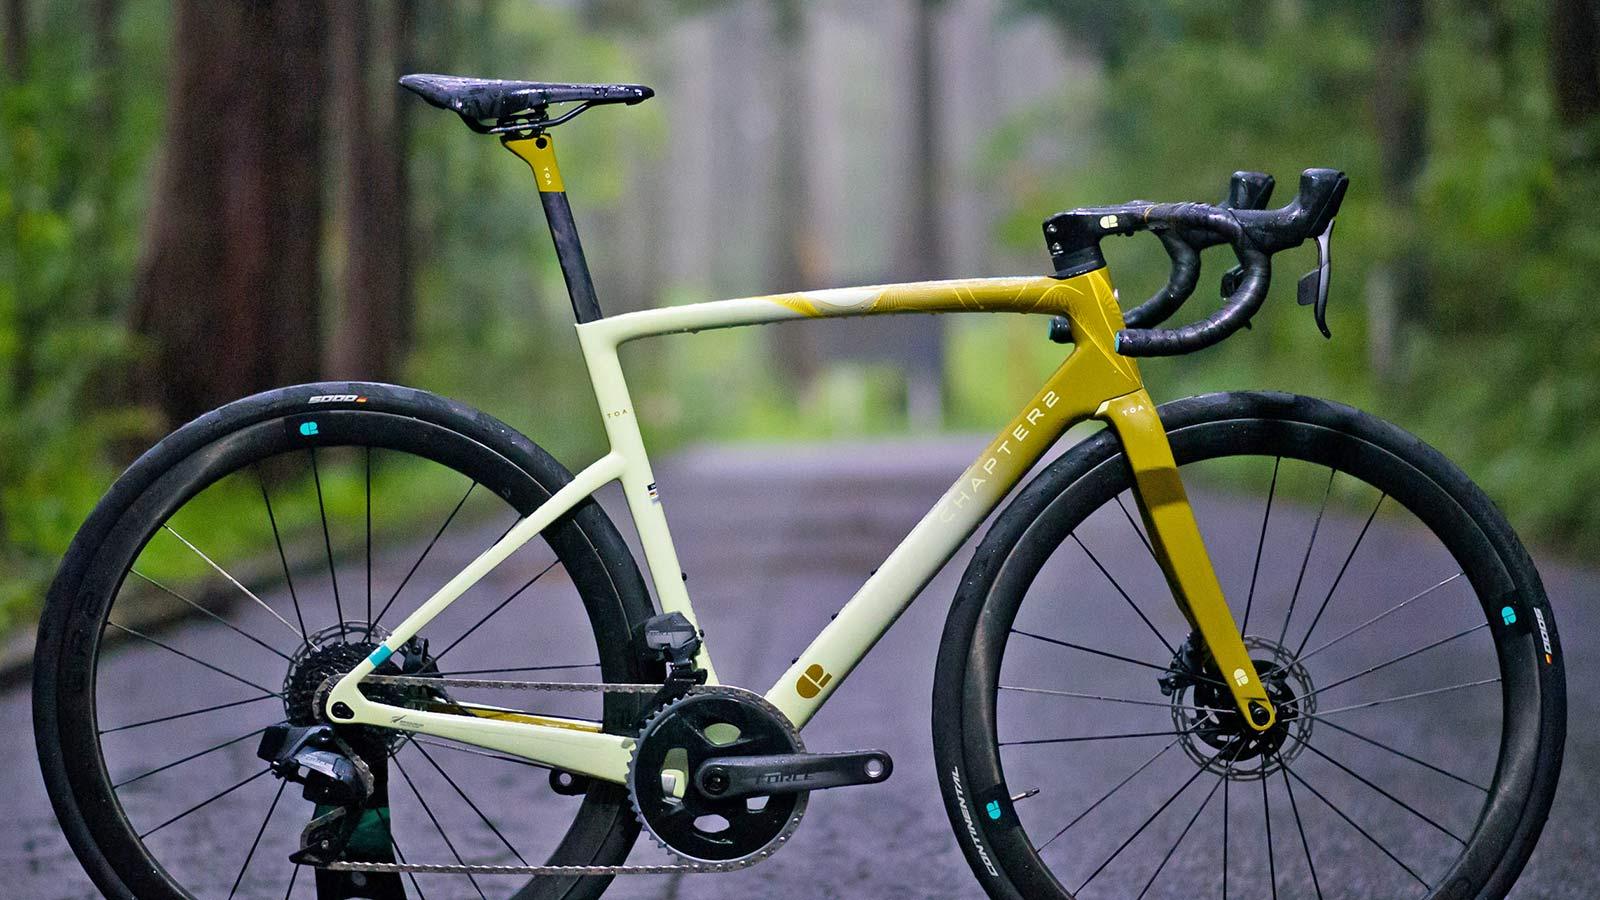 Chapter2 TOA all-road bike, fully integrated versatile aero carbon road bike,Tongariro